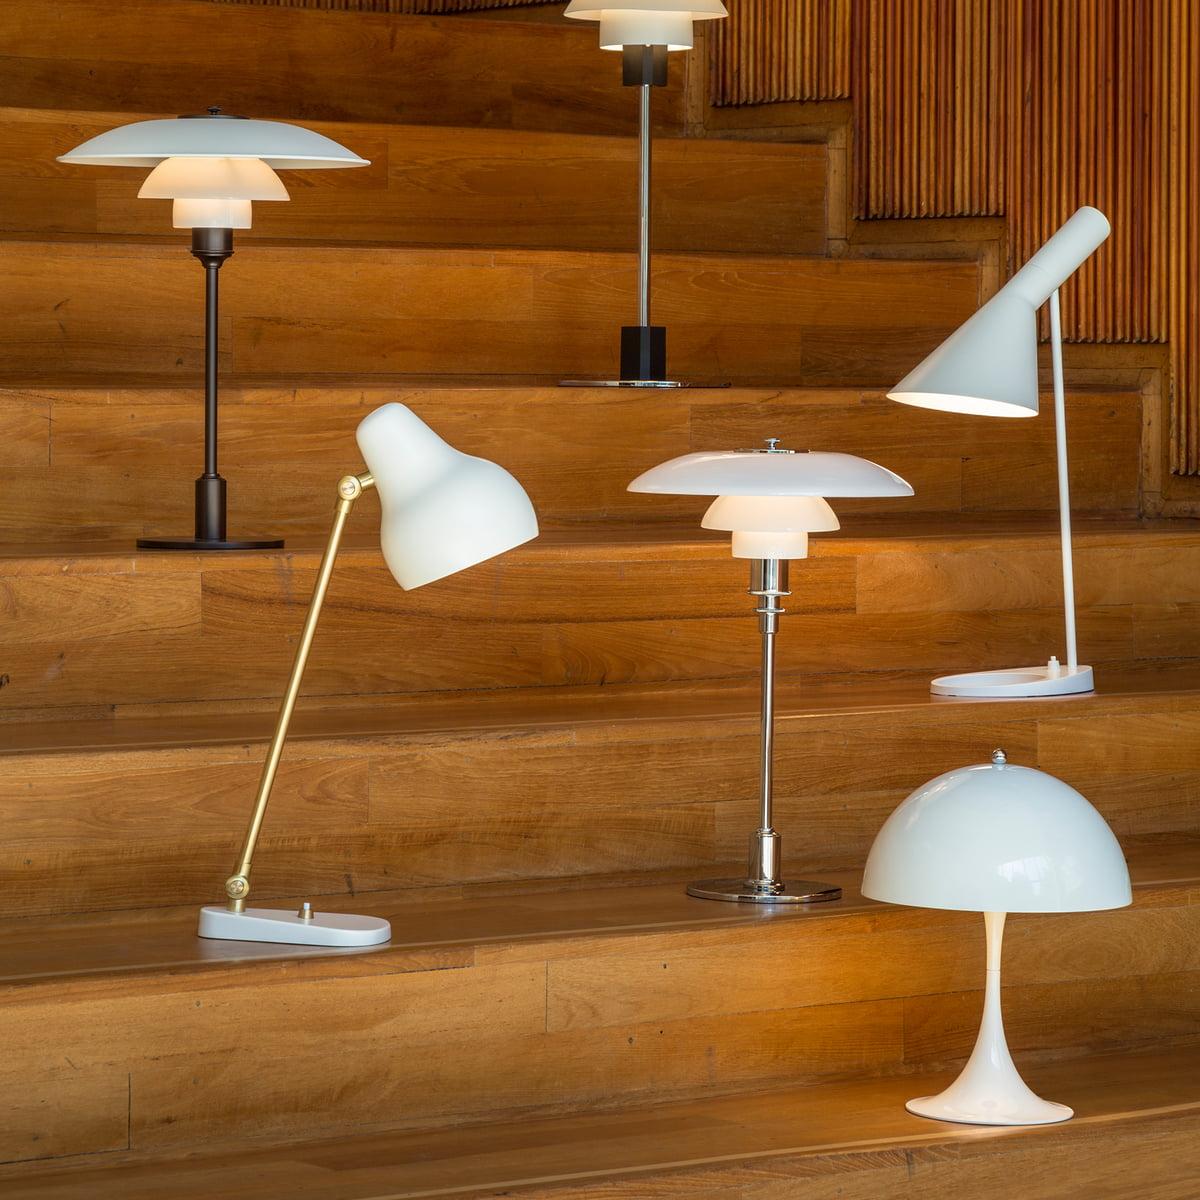 Panthella mini table lamp by louis poulsen white design table lamps by louis poulsen aloadofball Images